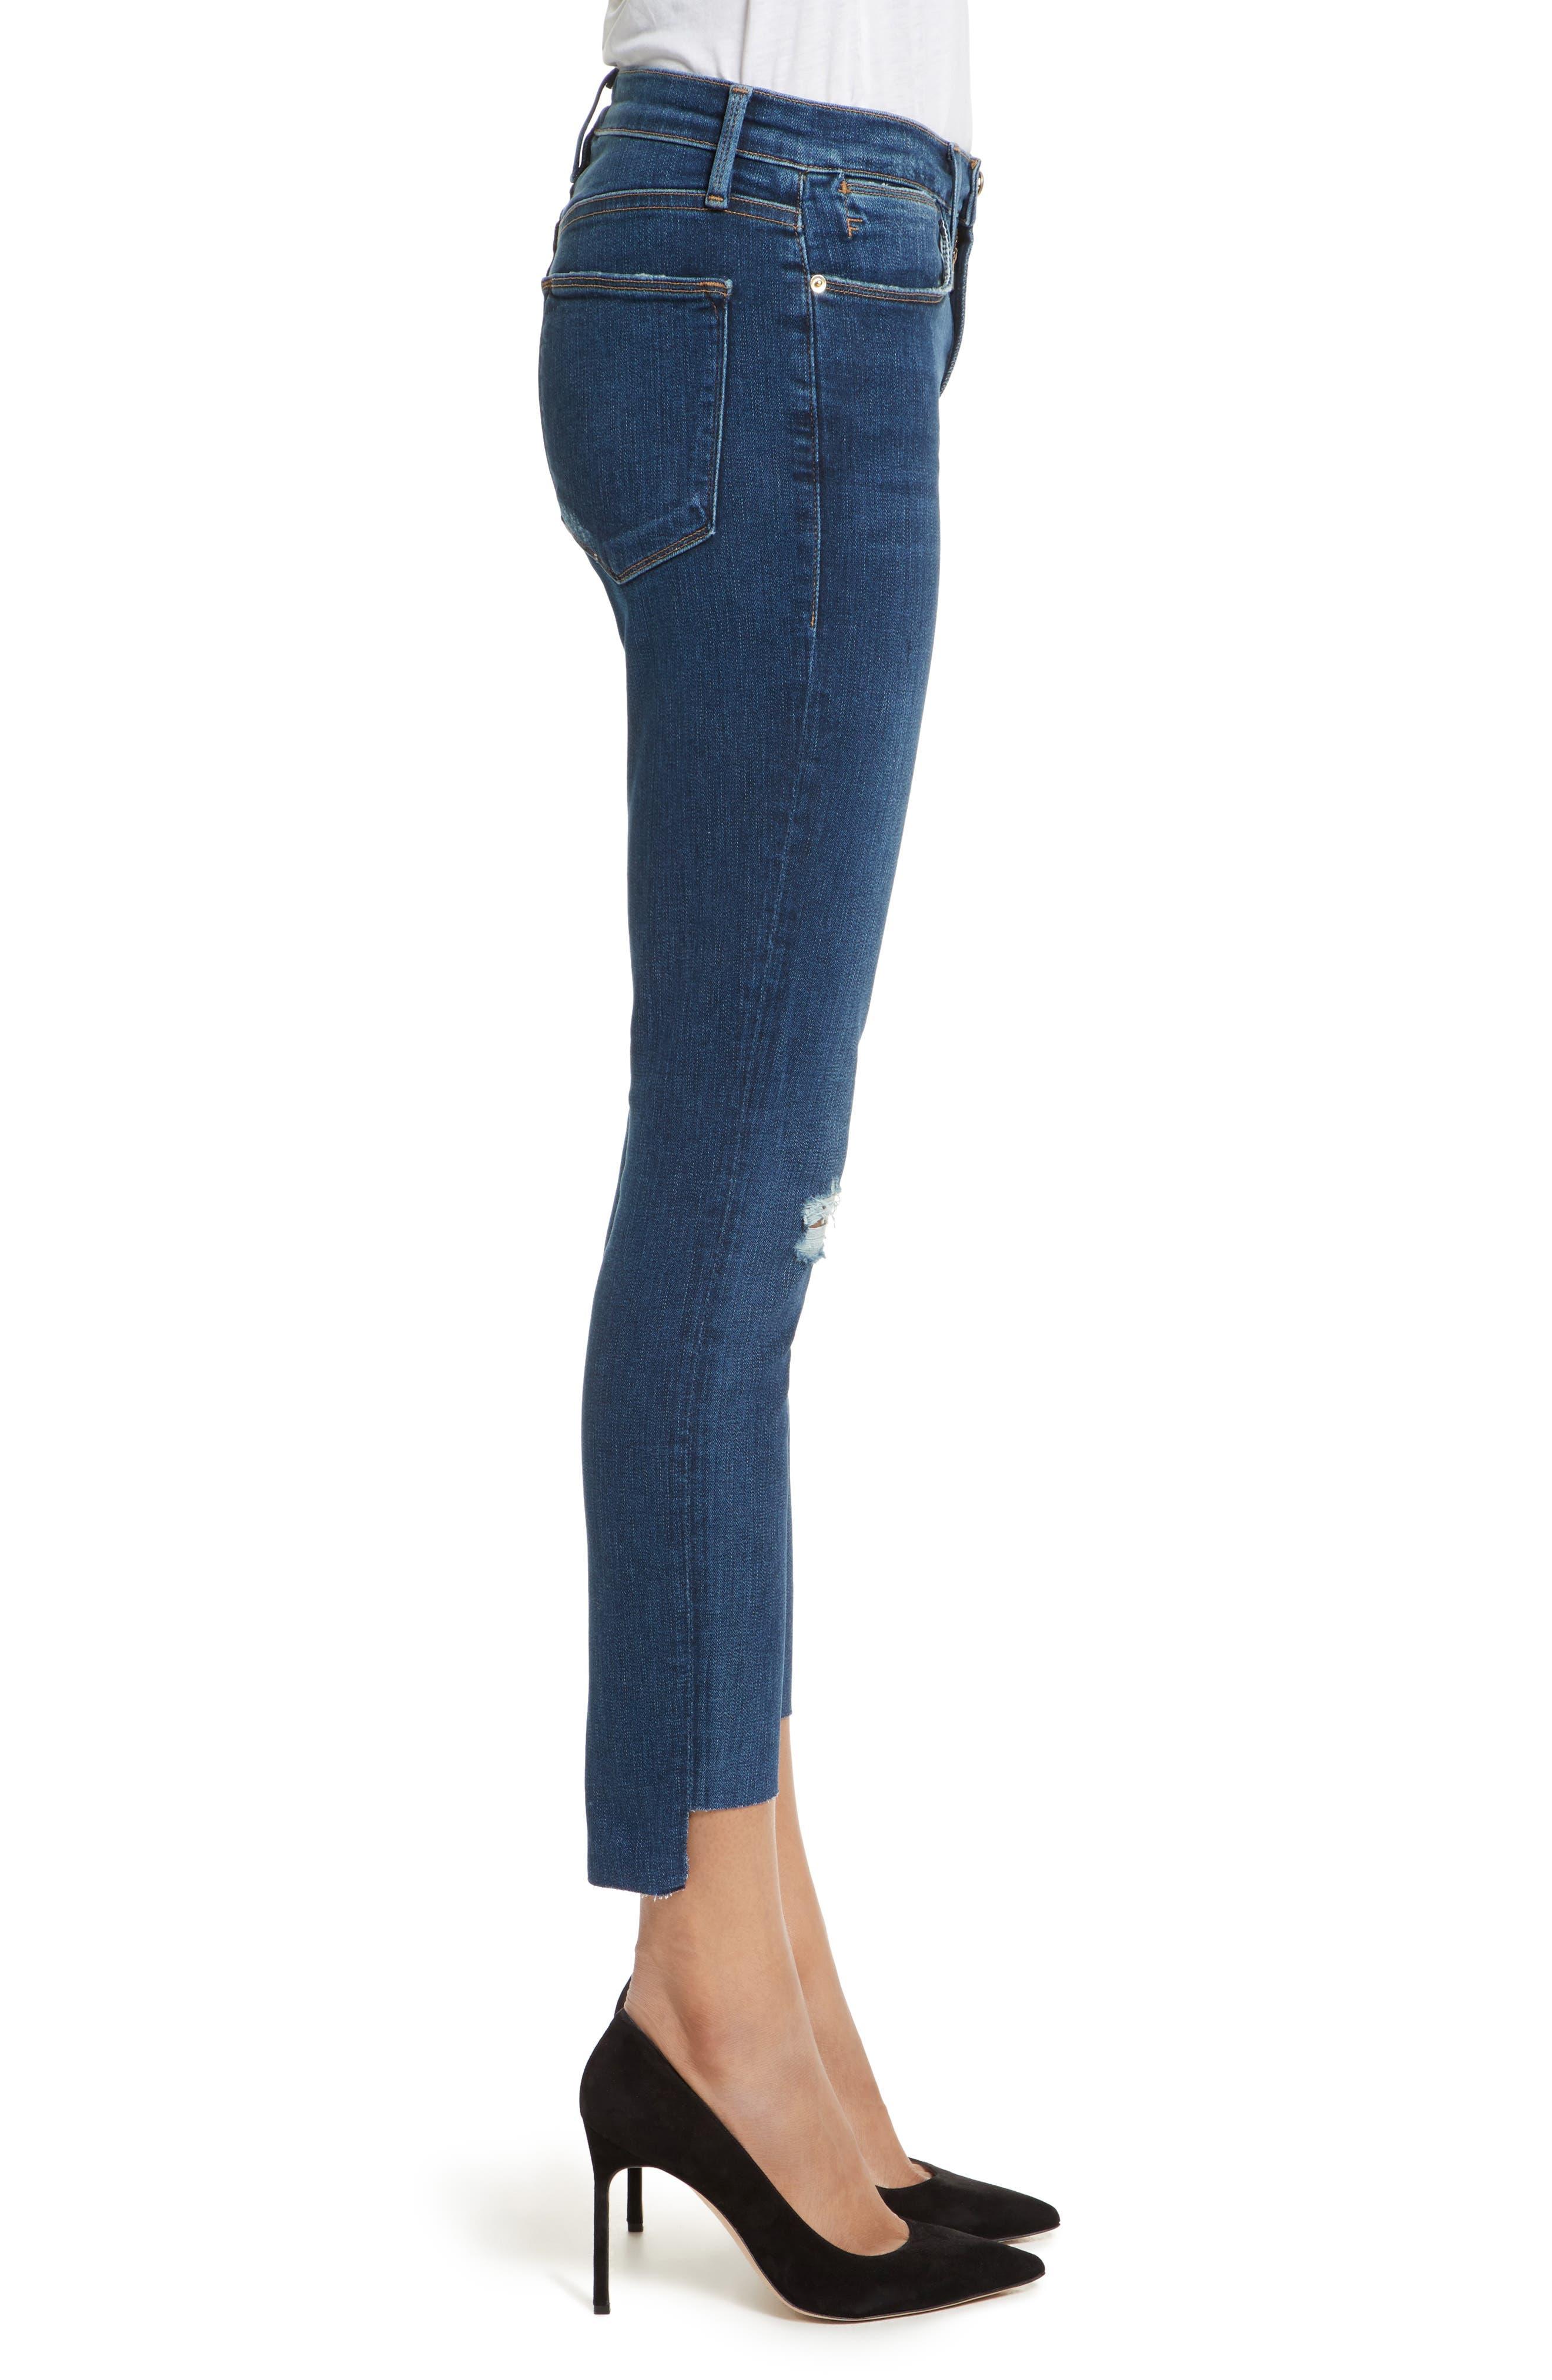 Alternate Image 3  - FRAME Le High High Waist Staggered Hem Slim Jeans (Baisley)